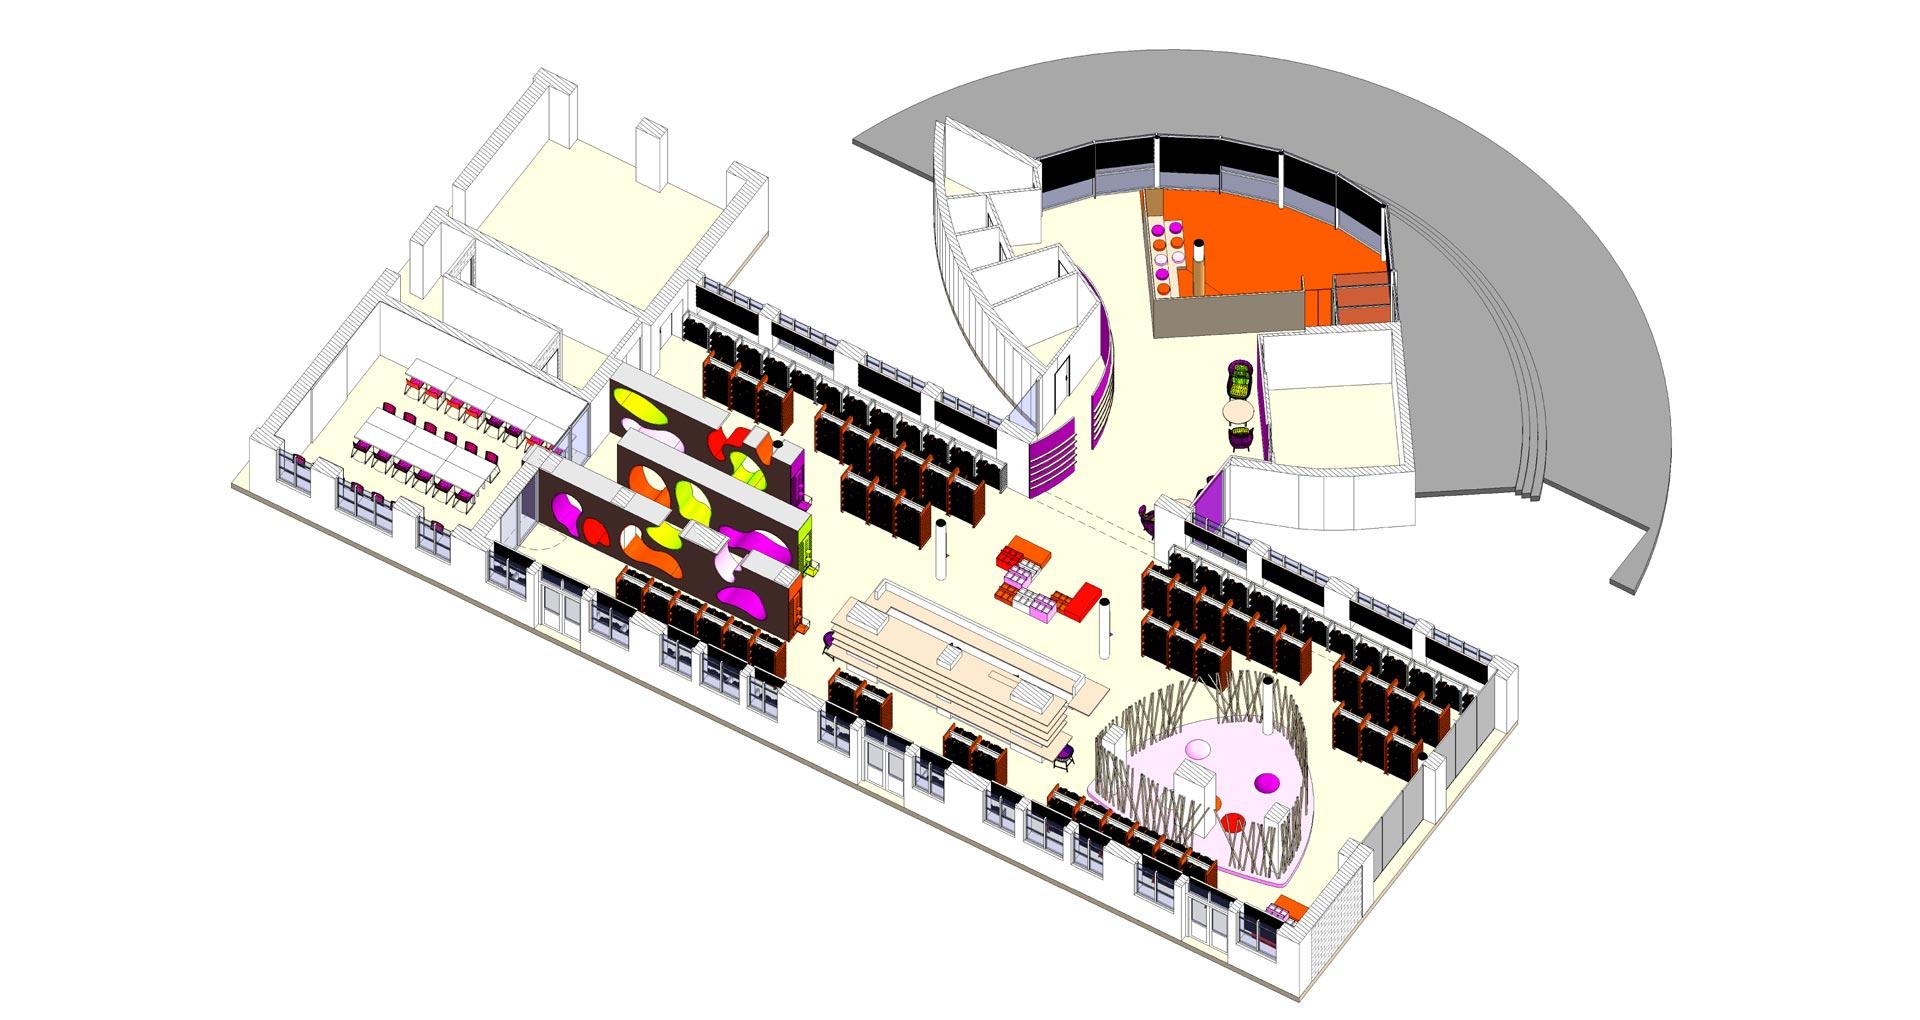 Design interieur Chauny